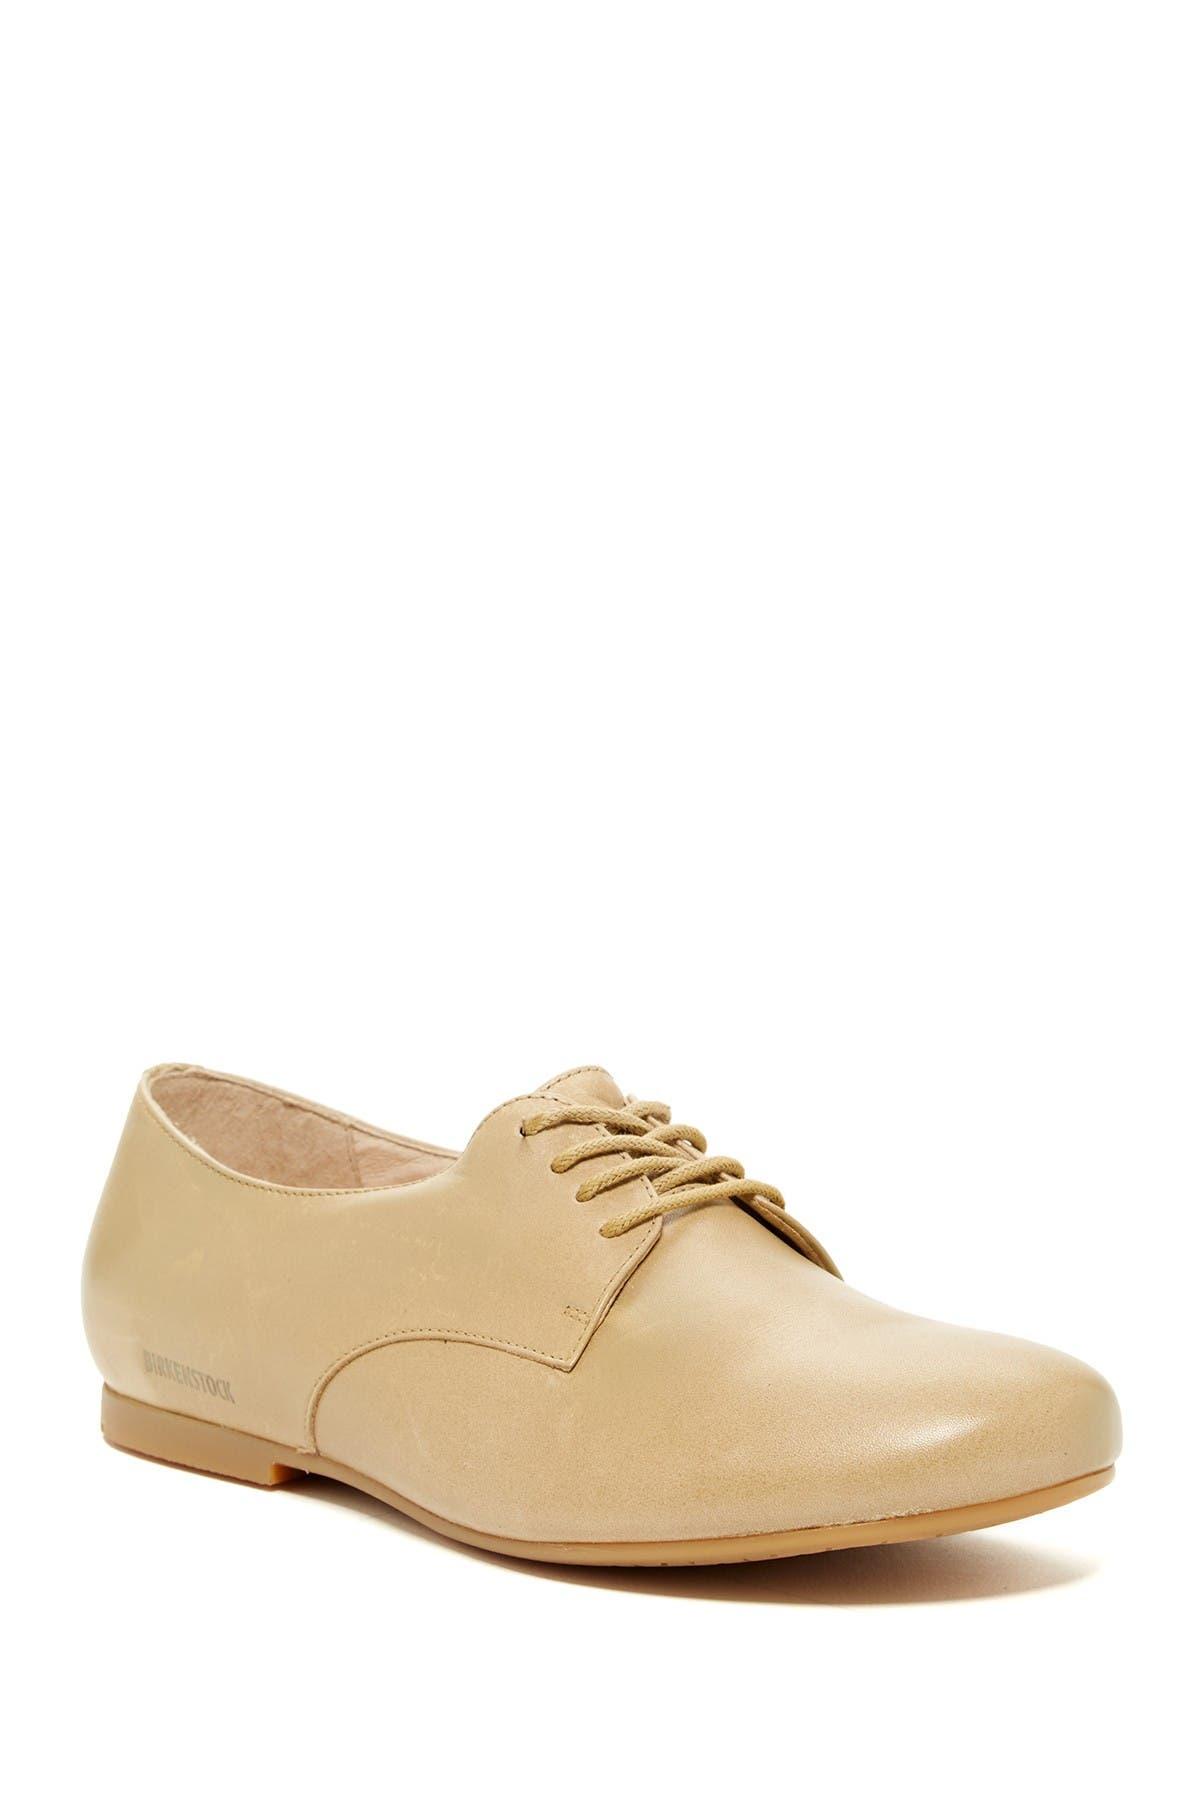 Image of Birkenstock Saunders Derby Shoe - Discontinued